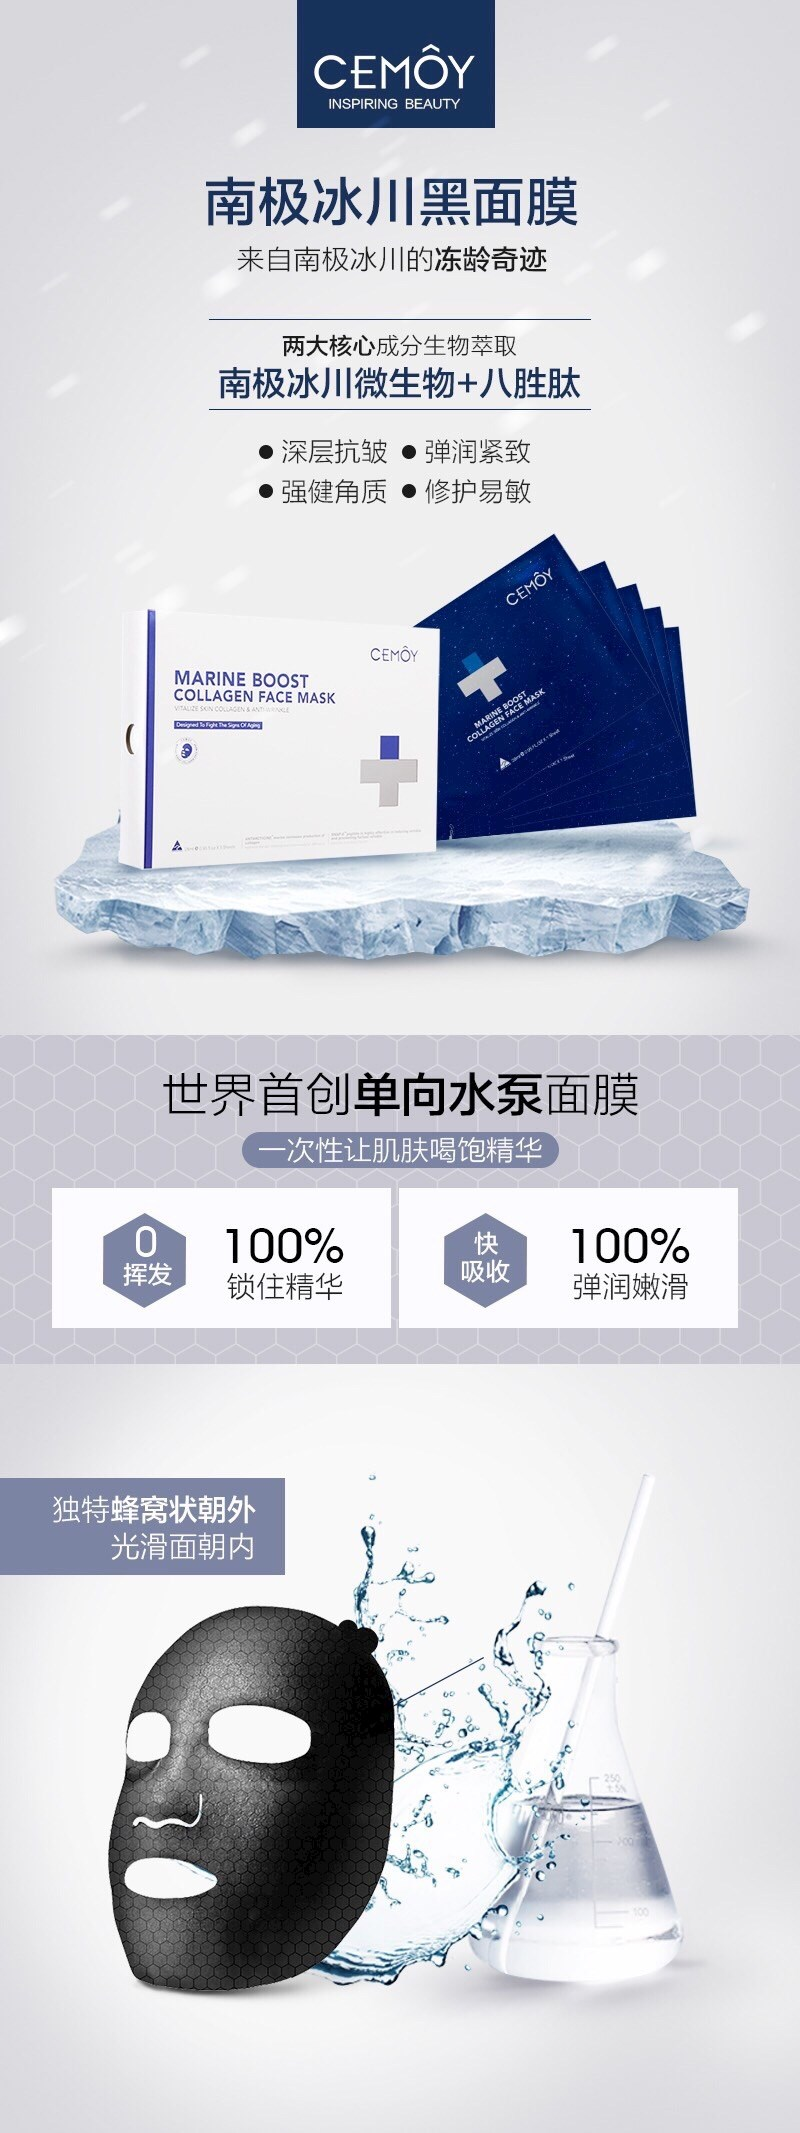 Cemoy 安瓶 南极冰川黑面膜 淡细纹紧致皮肤 5片装 – Yunnan 保健,美妆和个人护理商品